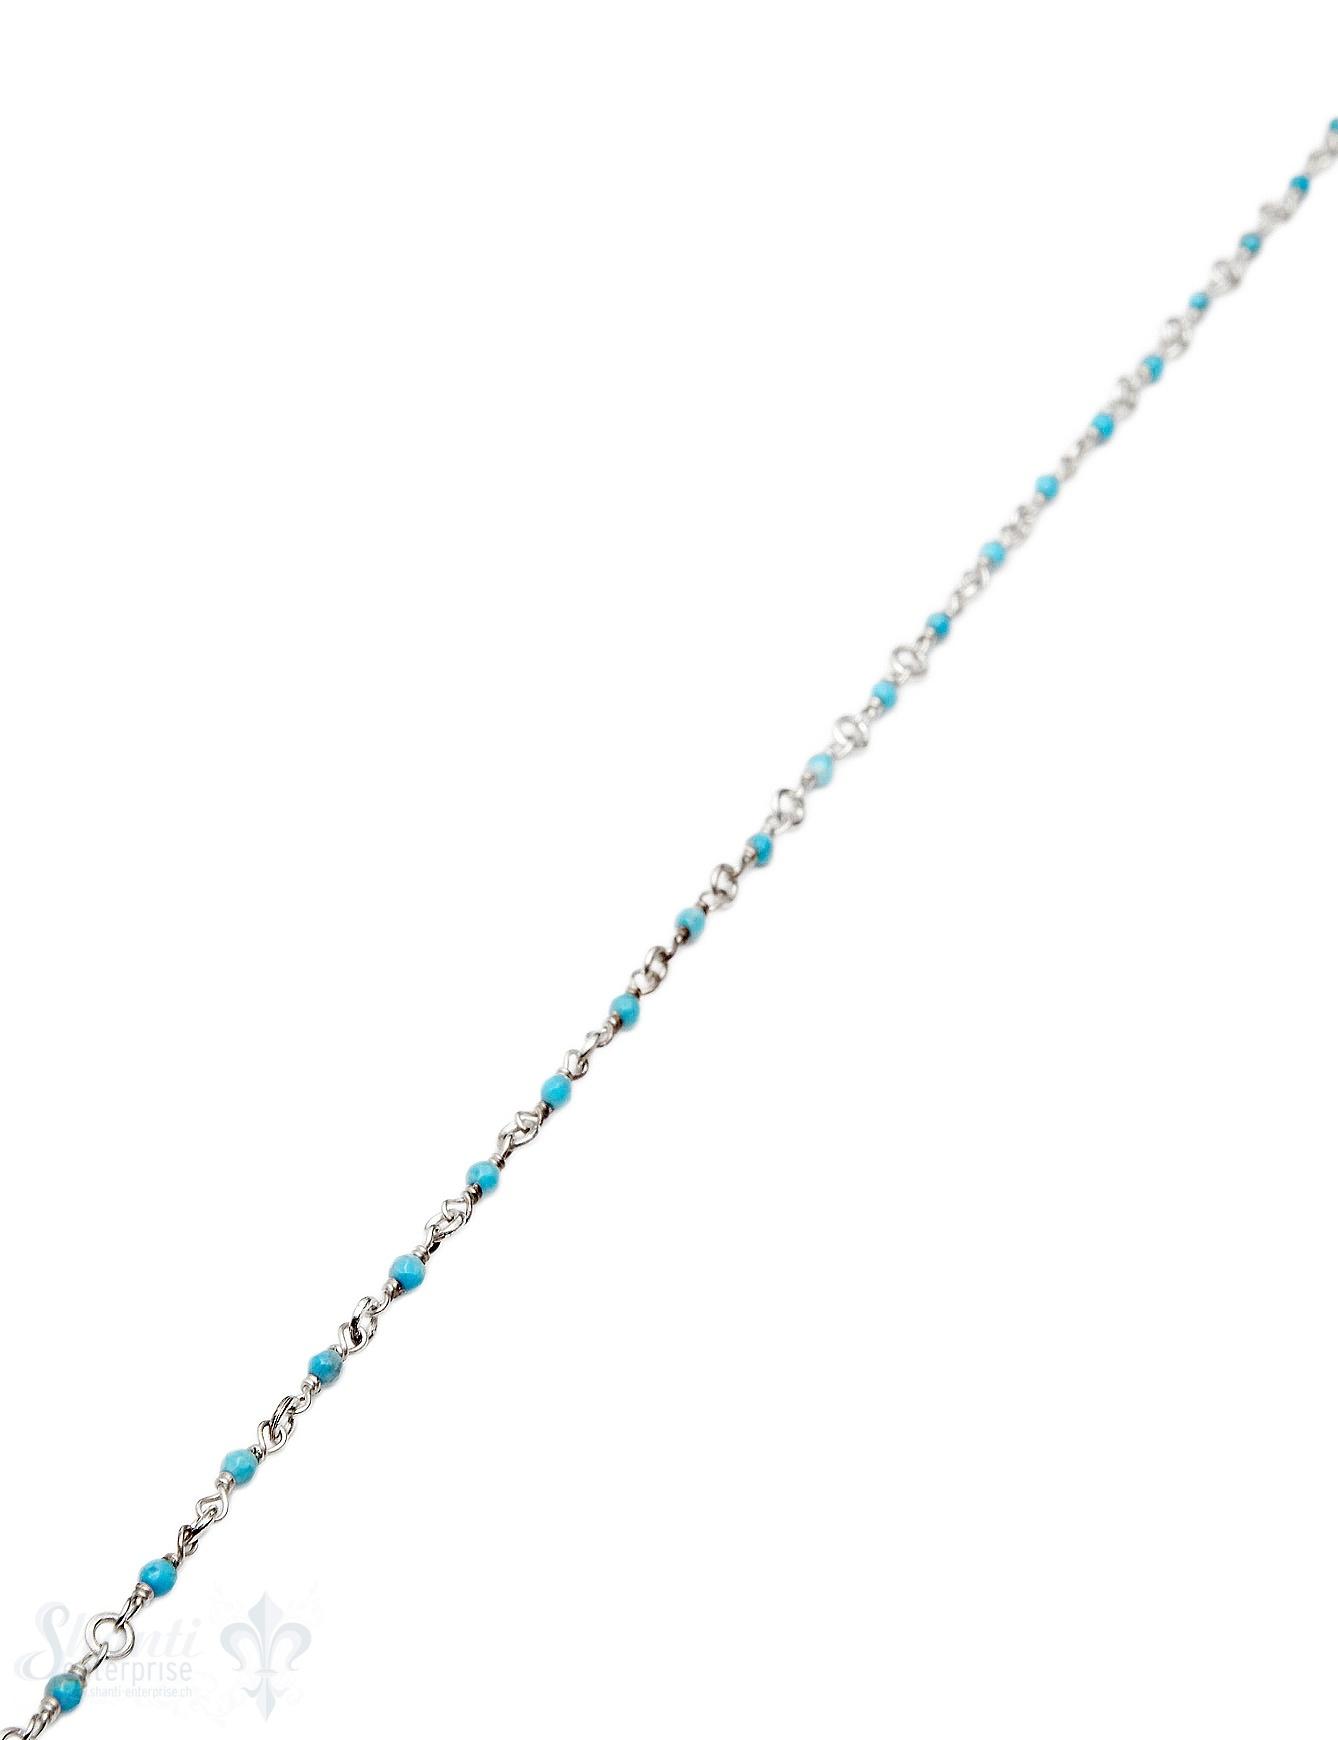 Rosenkranzkette Türkis gepresst himmelblau 2 mm ru